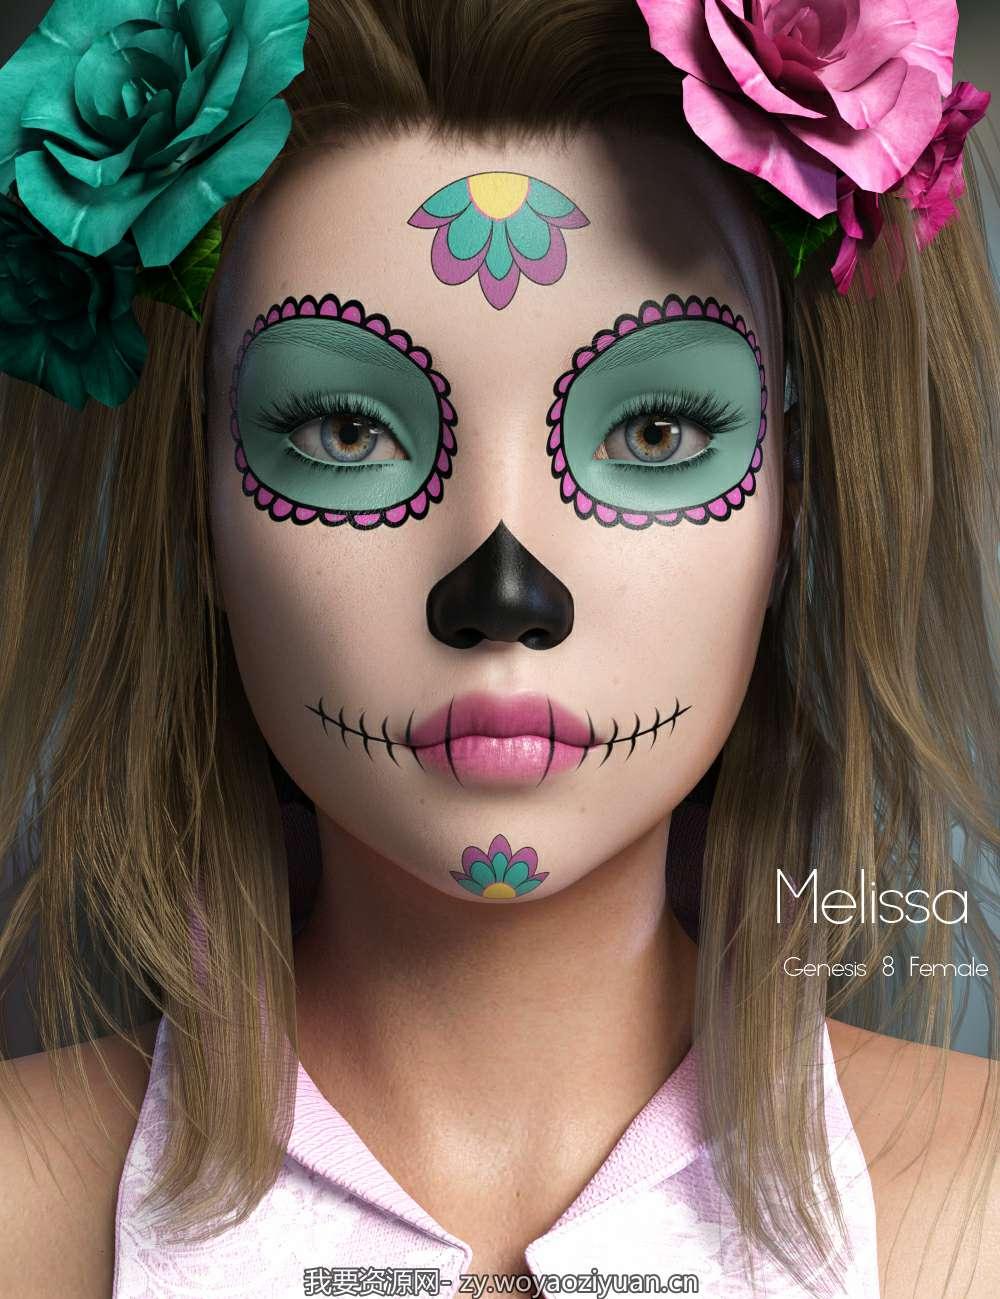 P3D Melissa for Genesis 8 Female